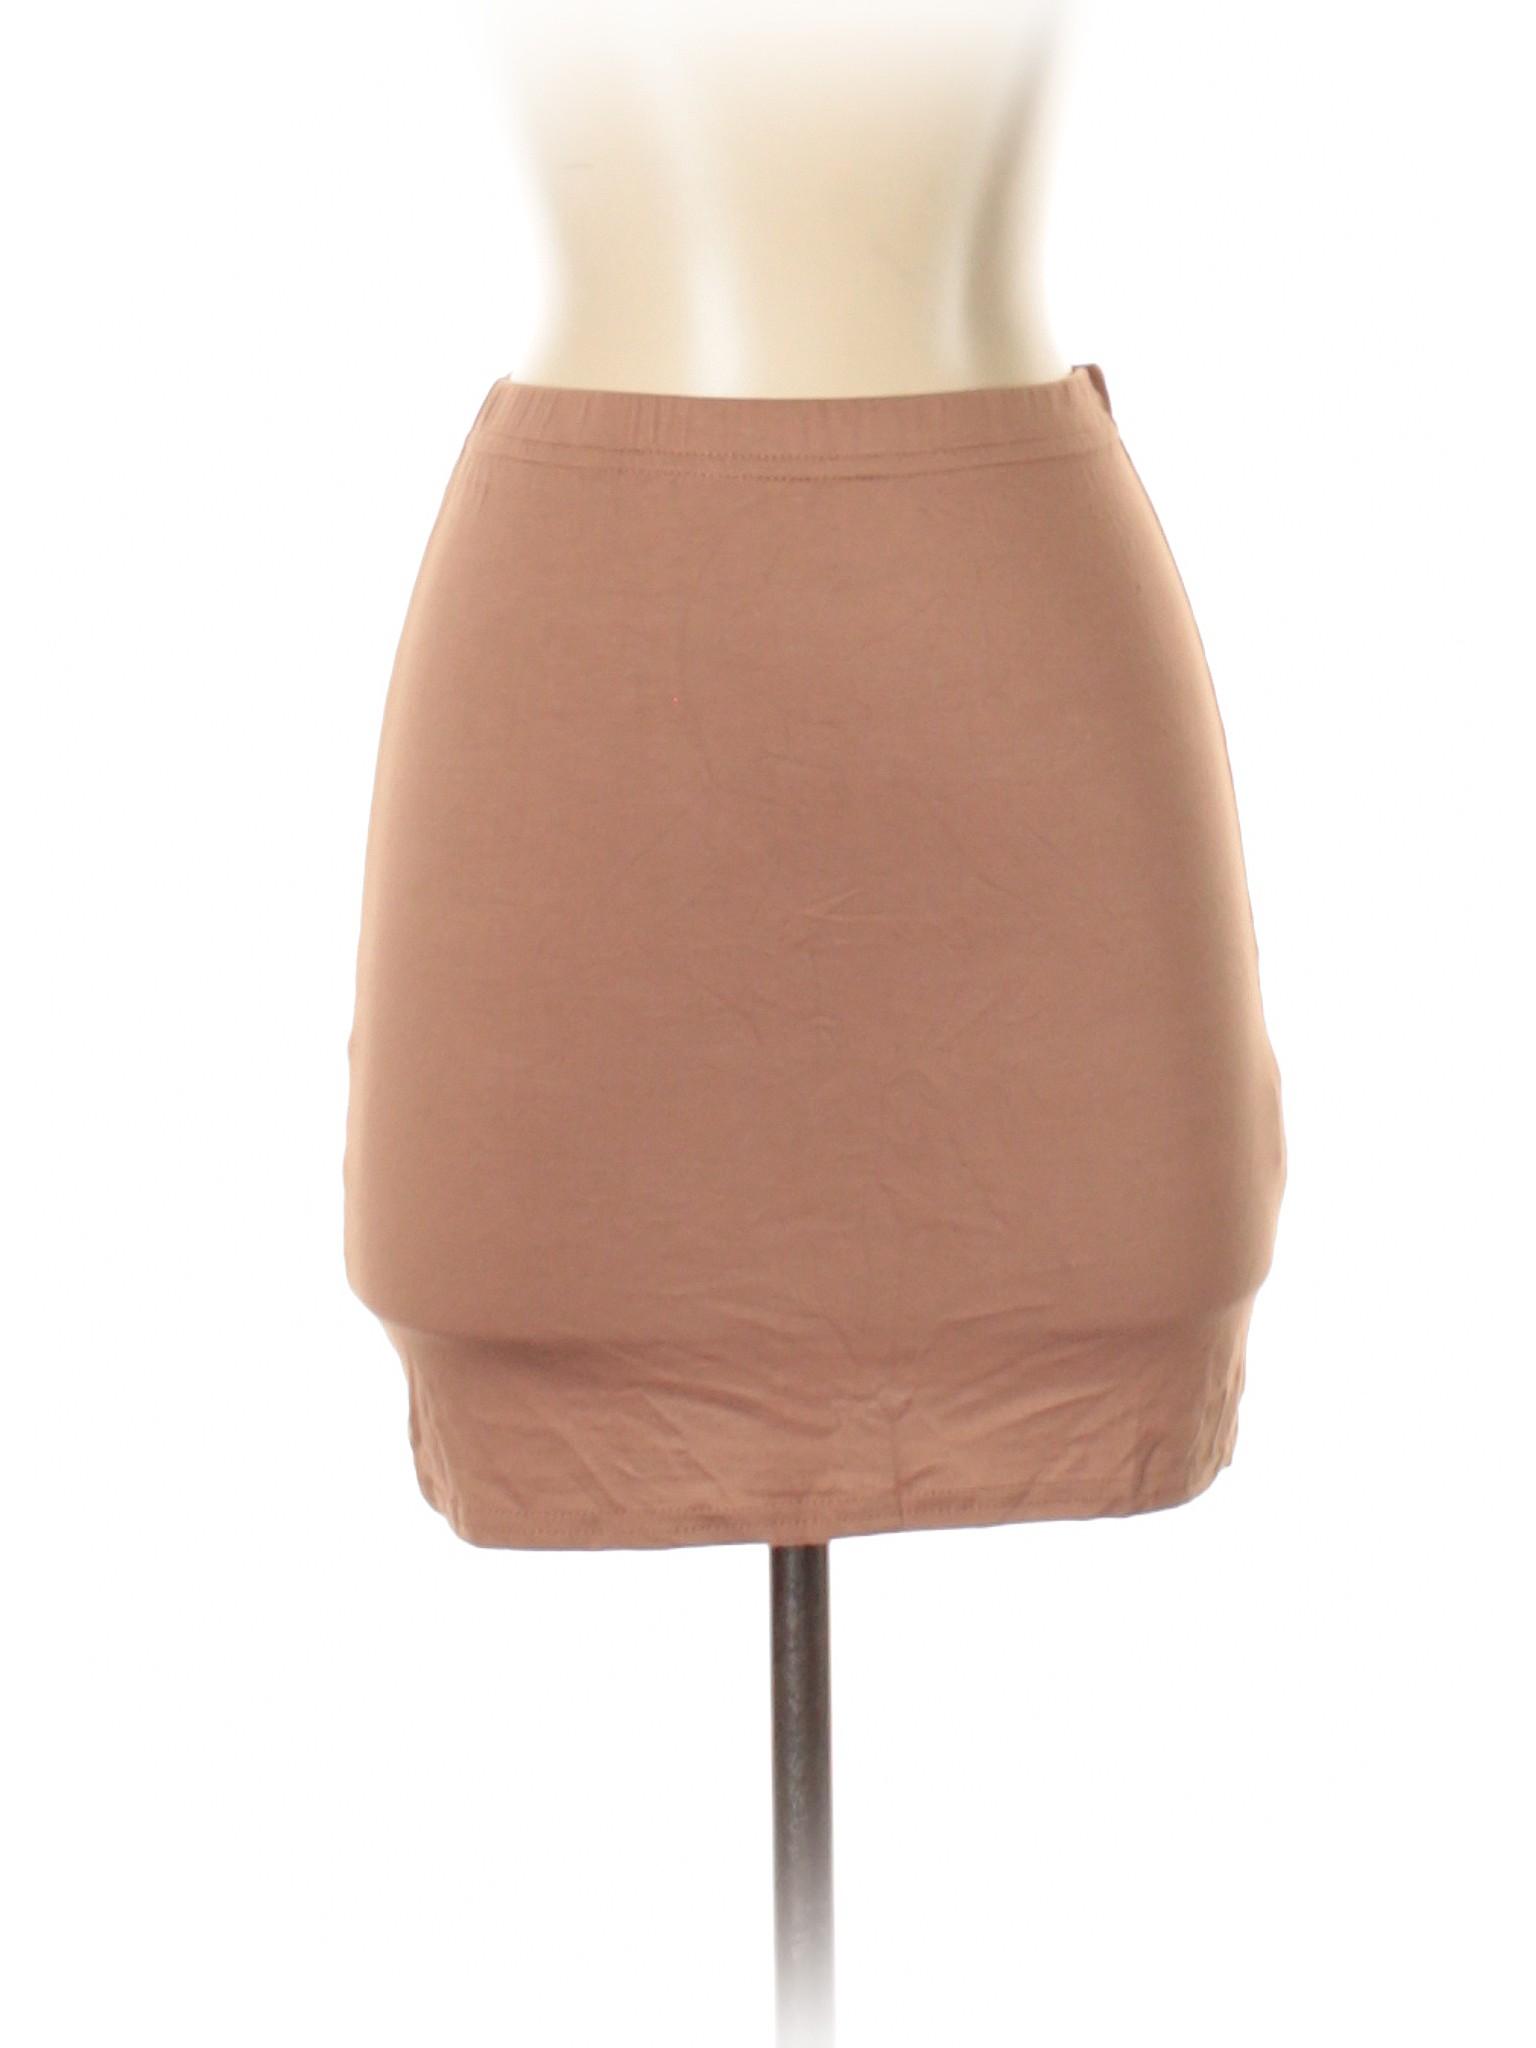 Boutique Boutique Boohoo Boohoo Skirt Casual Boutique P7pn1q8w